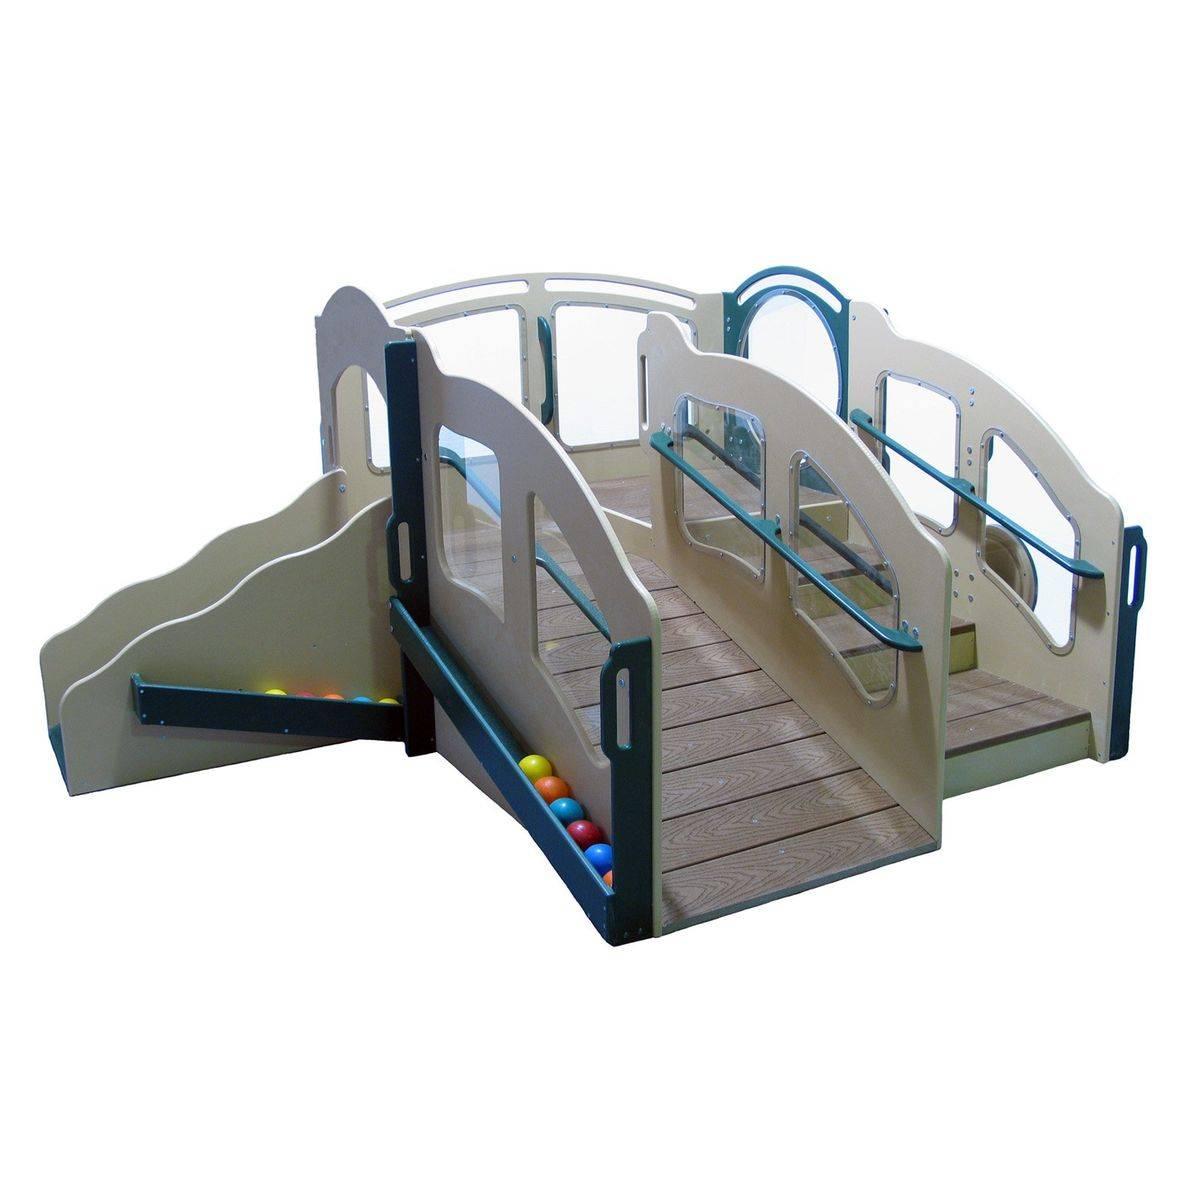 natural playground ideas-275212227227076349